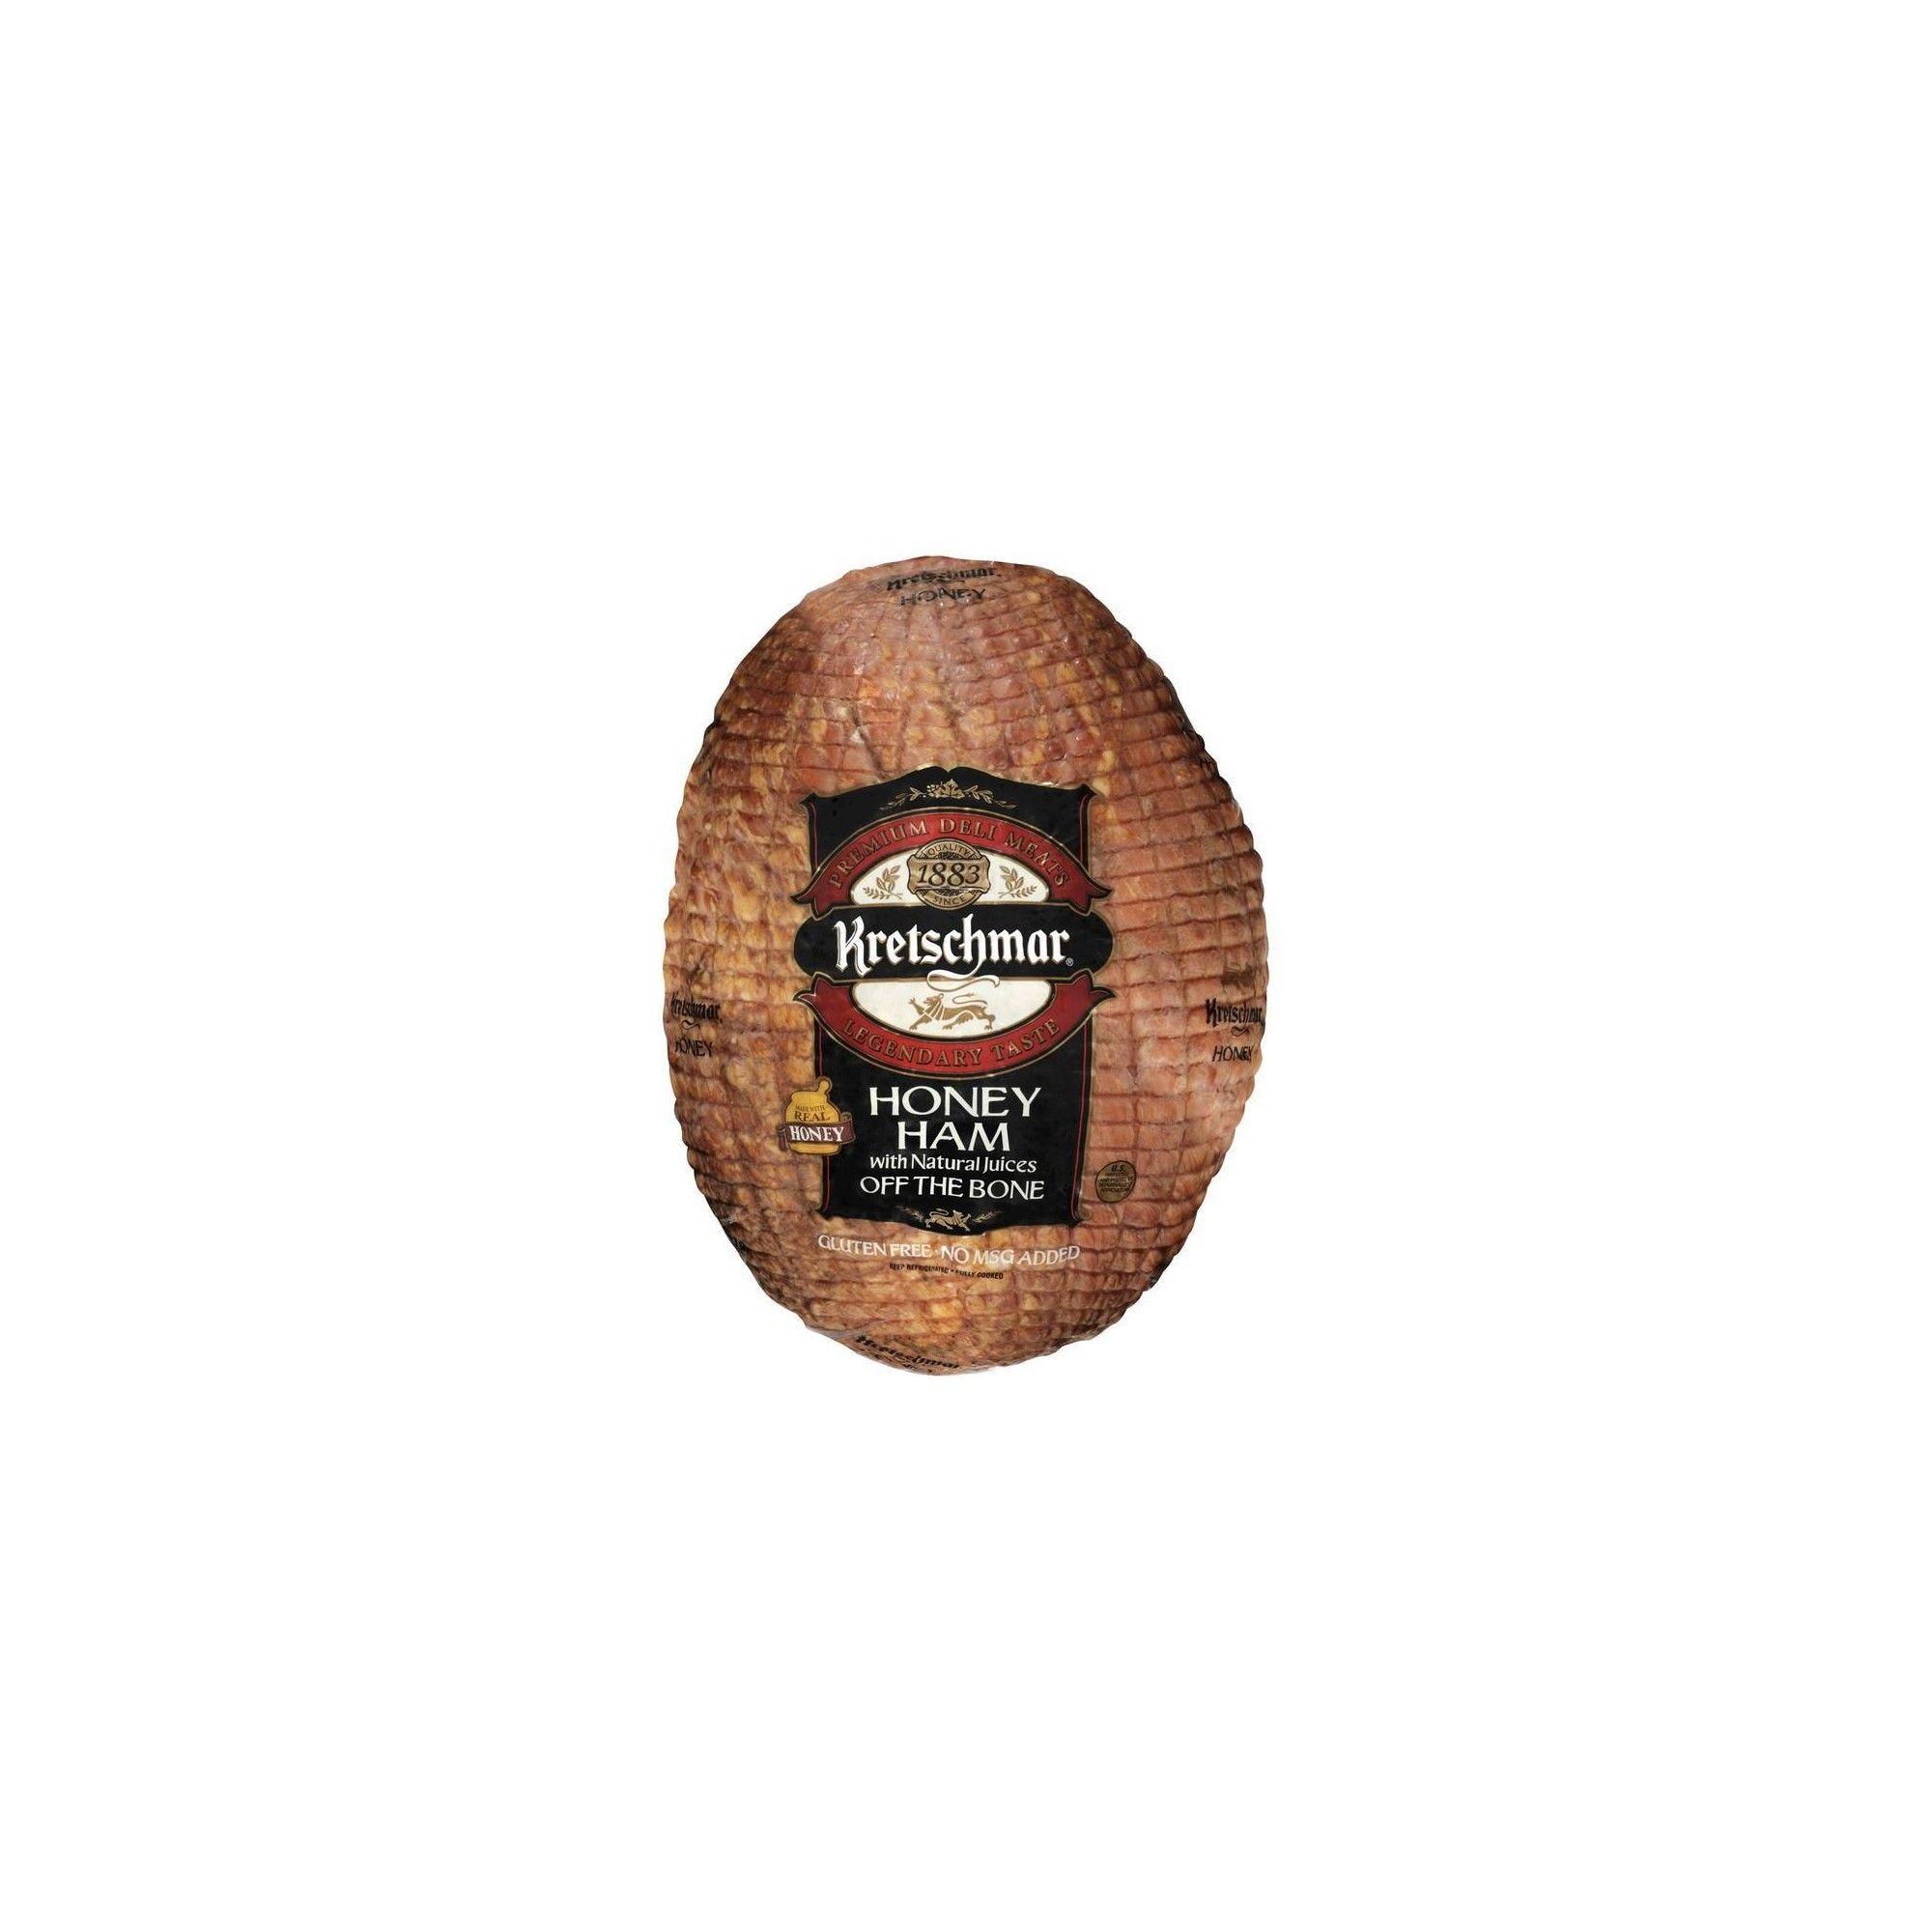 Kretschmar Honey Ham Off The Bone - Priced Per lb.  Honey ham